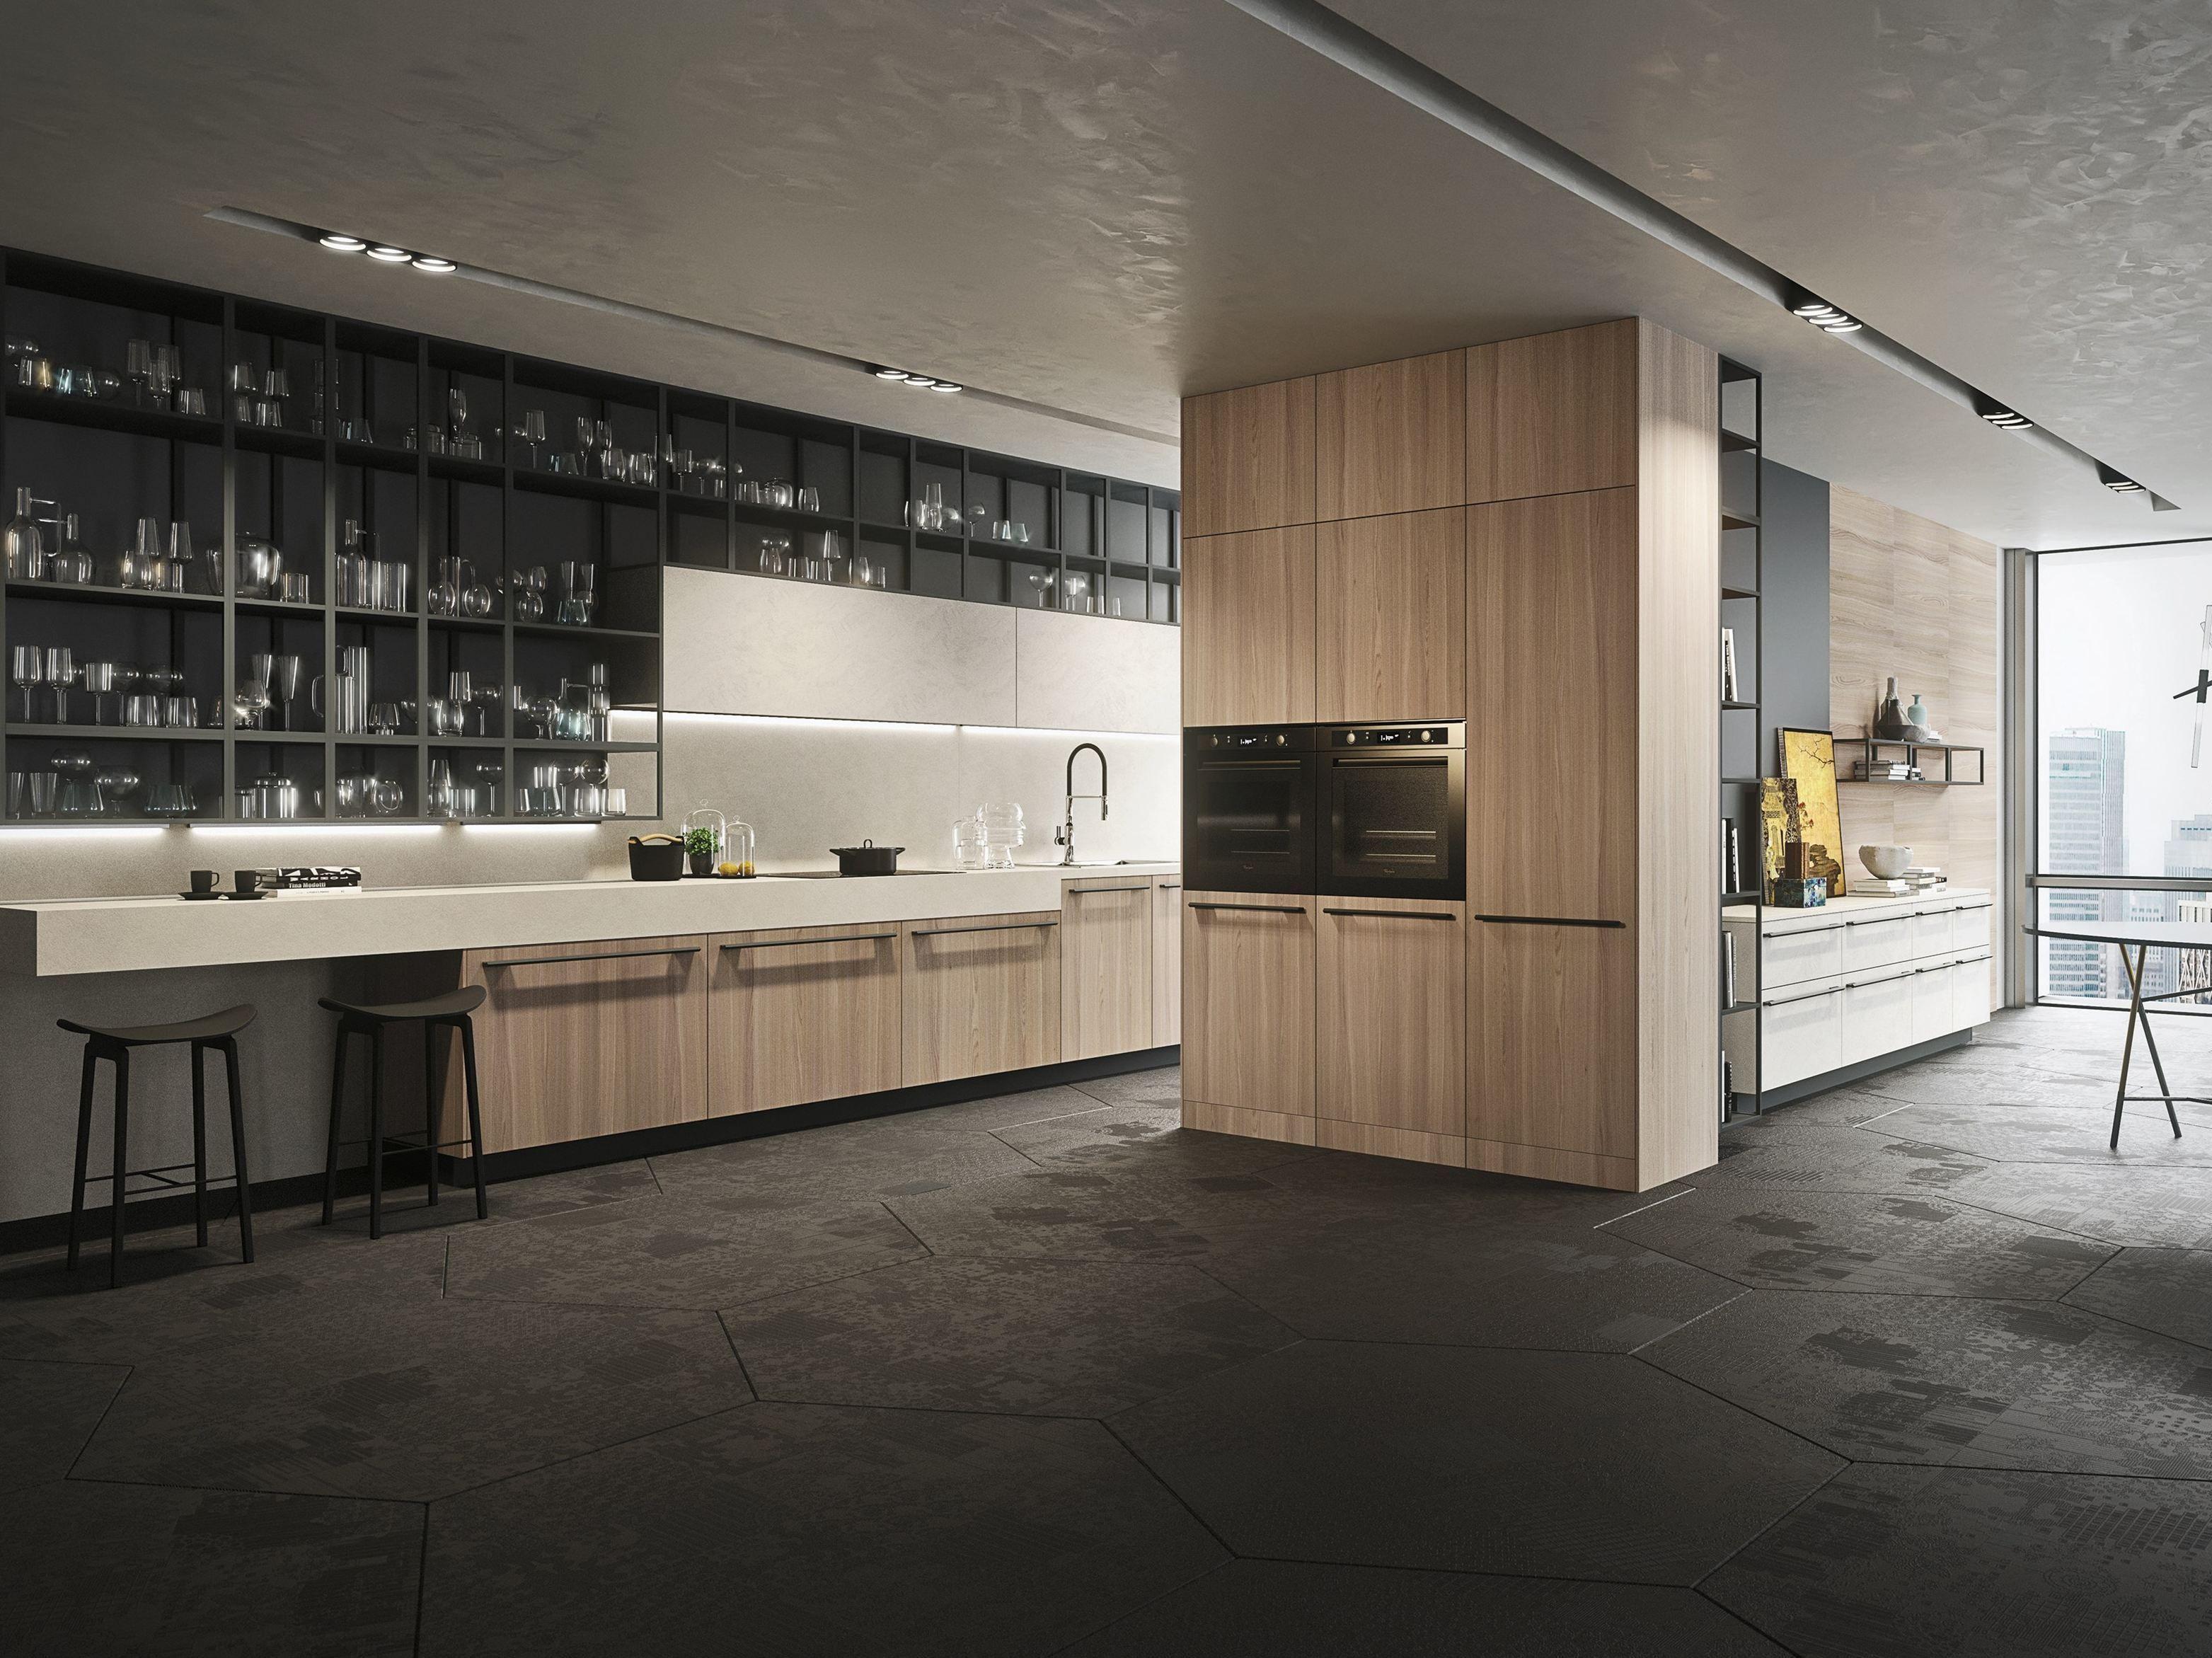 Opera linear kitchen by snaidero design michele marcon for Linear kitchen design